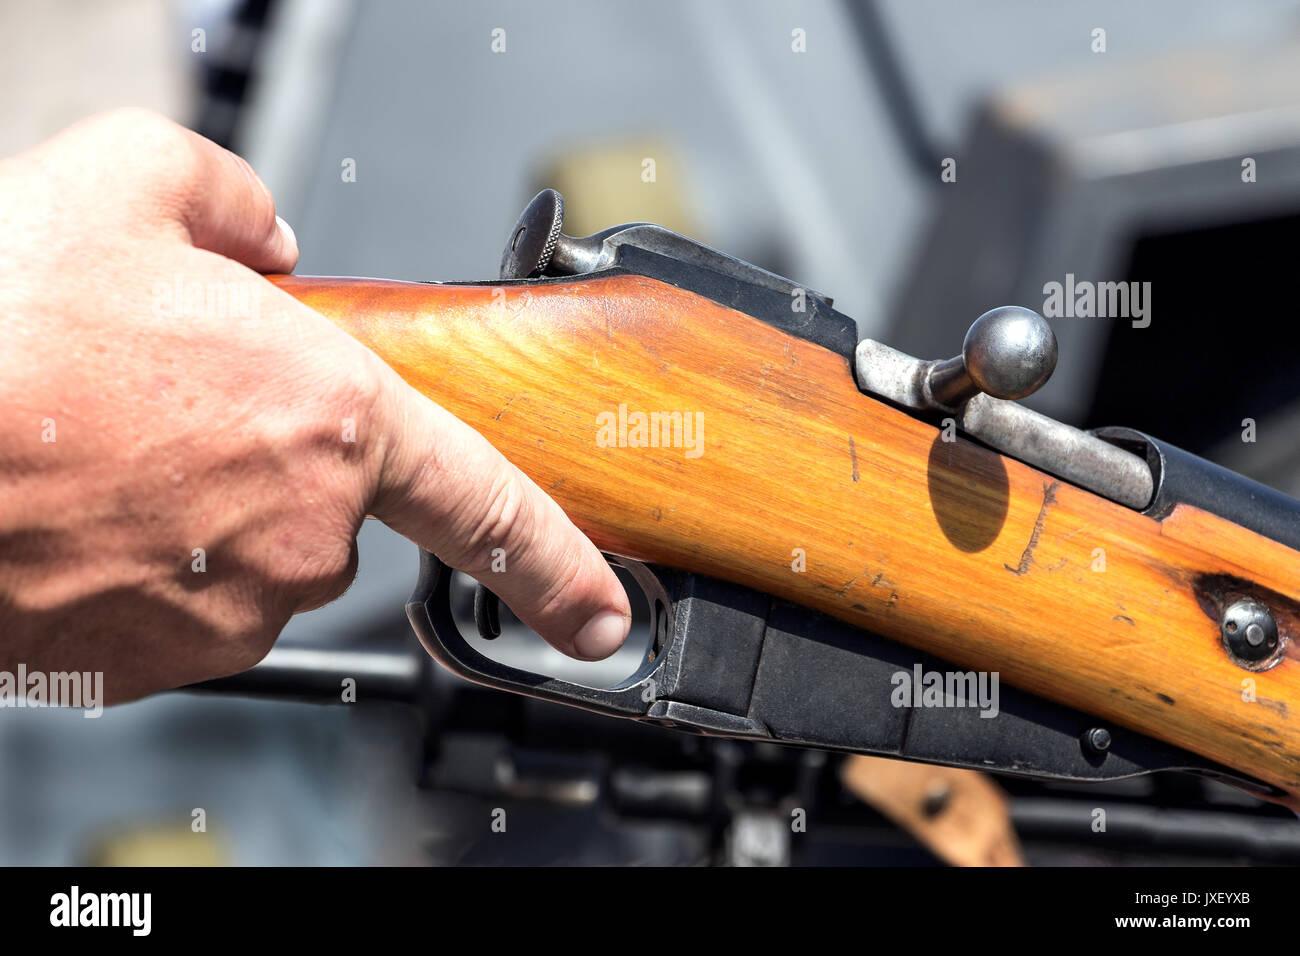 Finger on the trigger - Stock Image